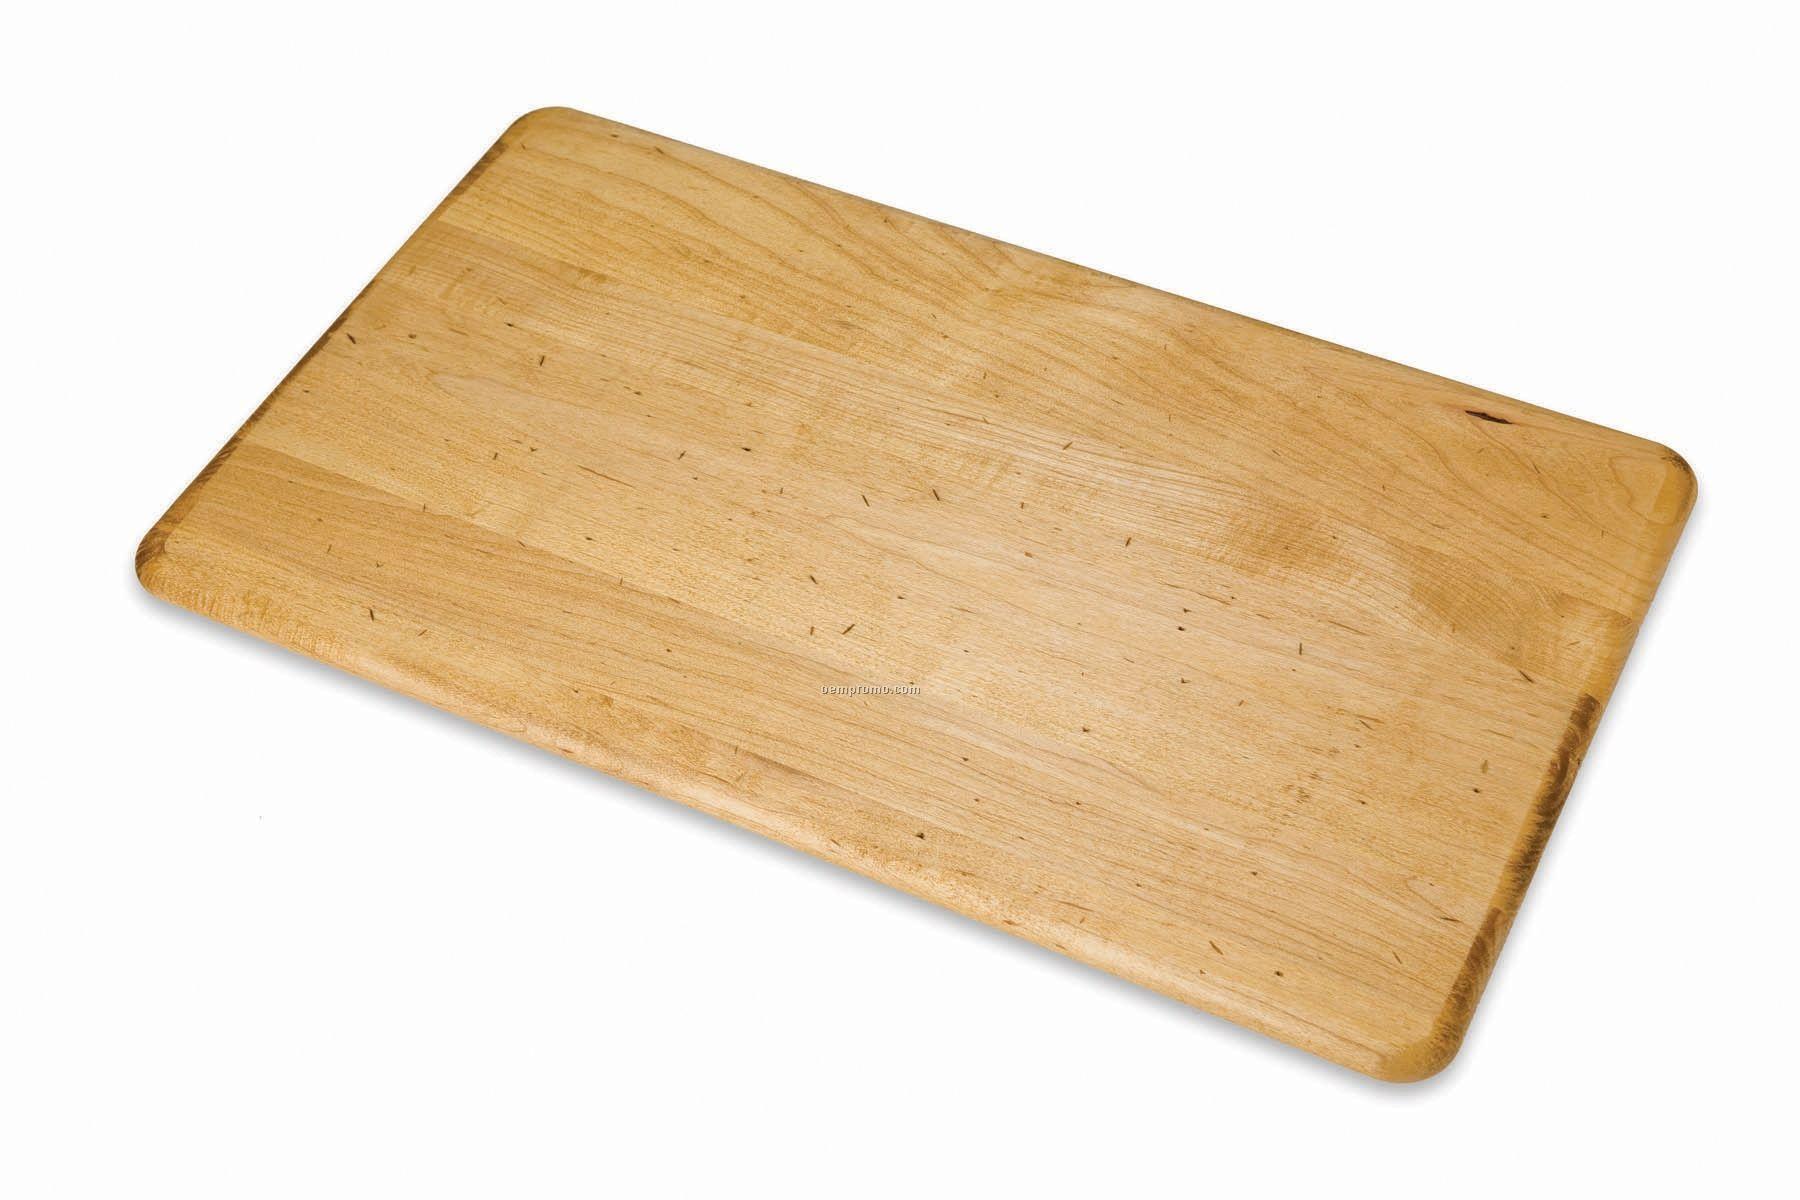 Artisan Board - Serving Plank